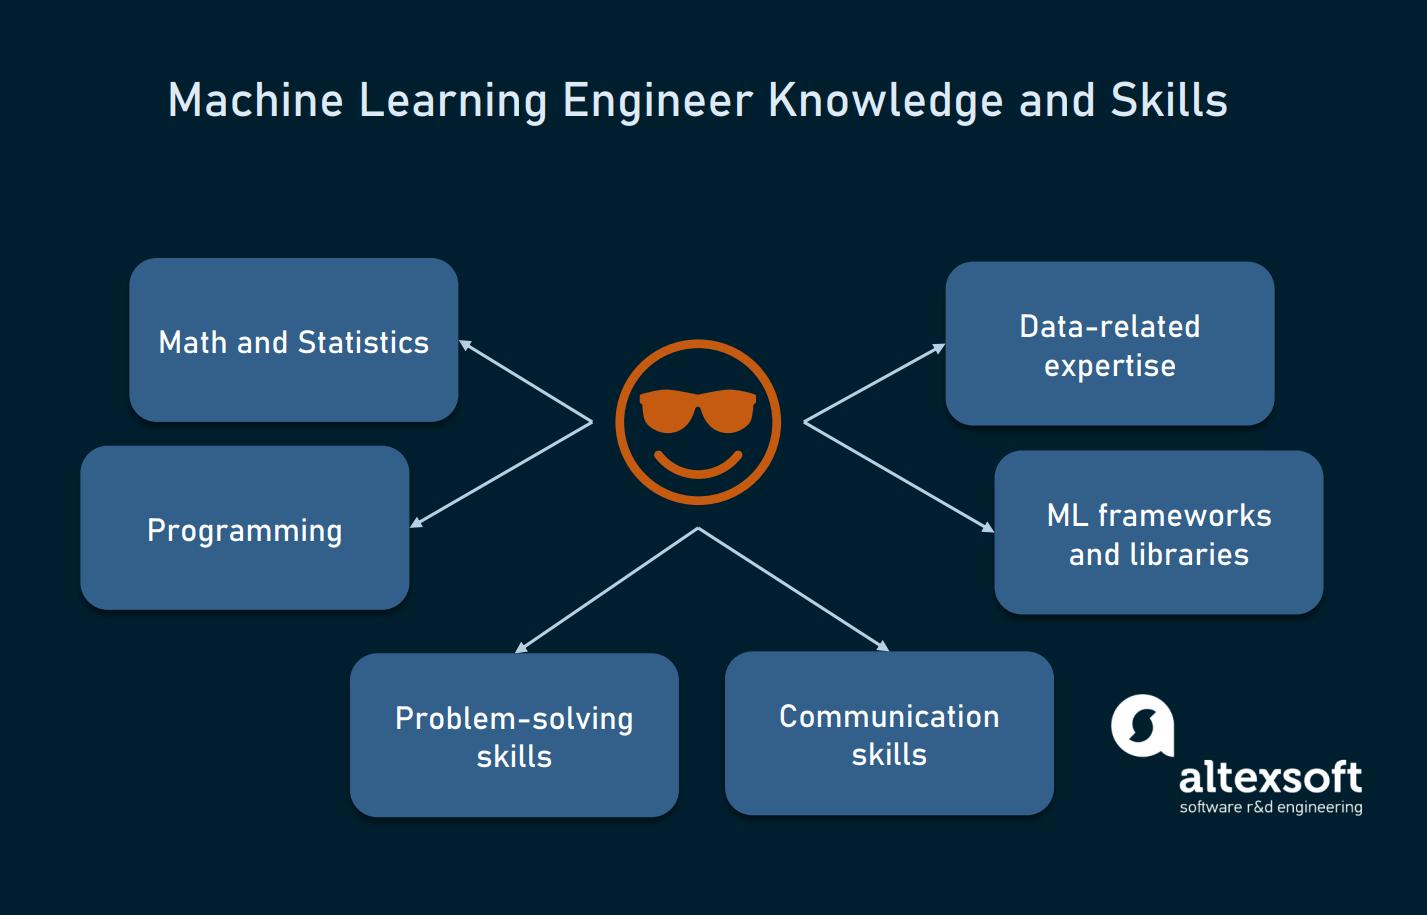 Machine Learning Engineer basic skills